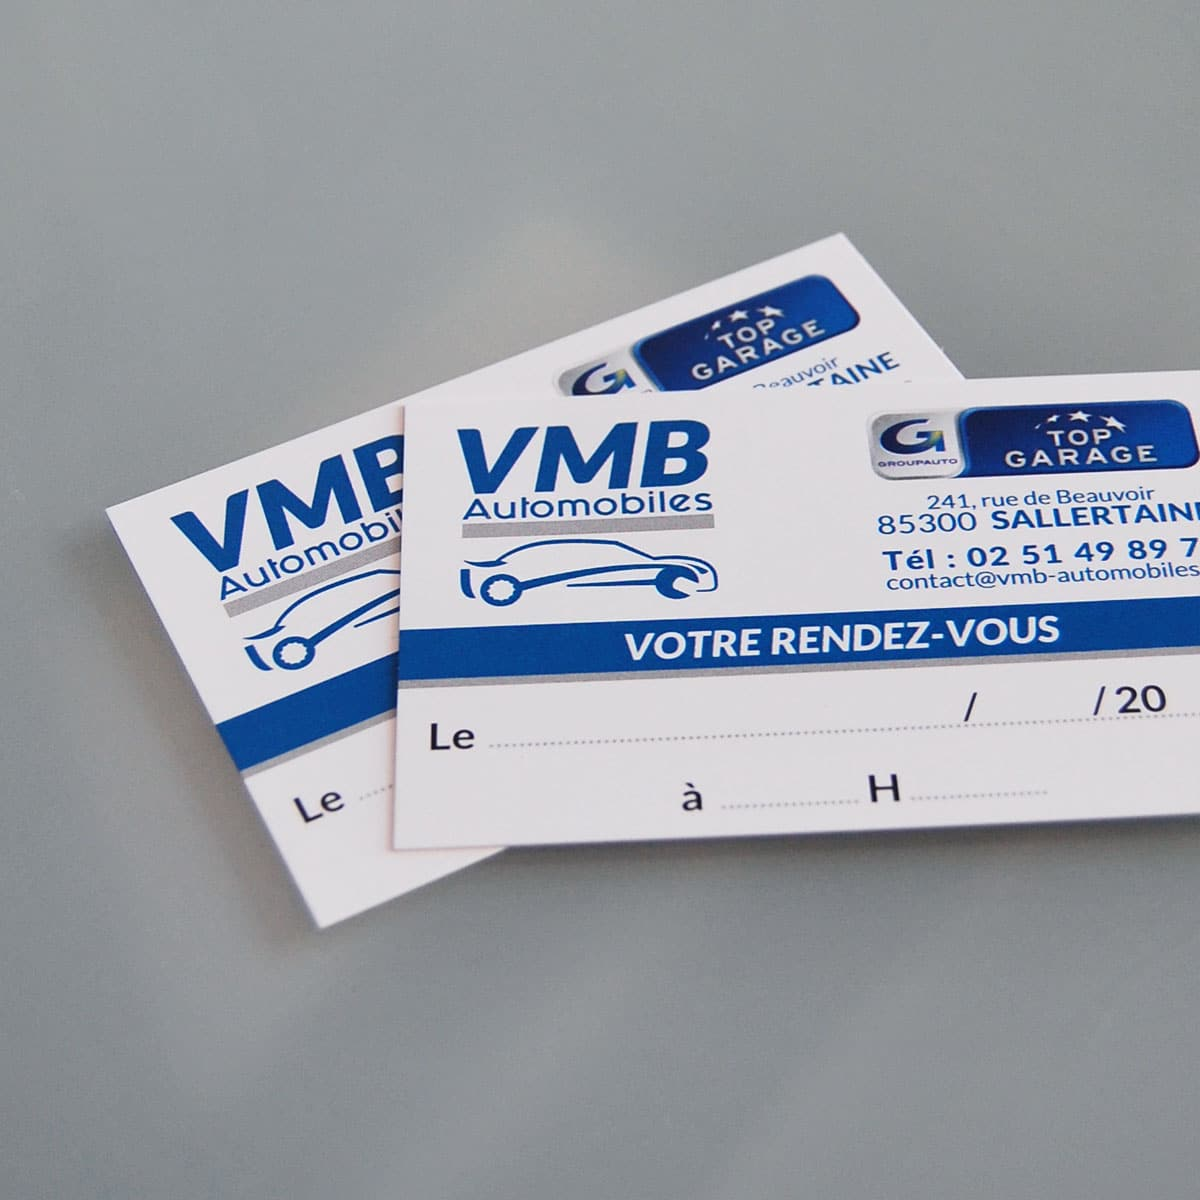 vmb-automobiles-carte2